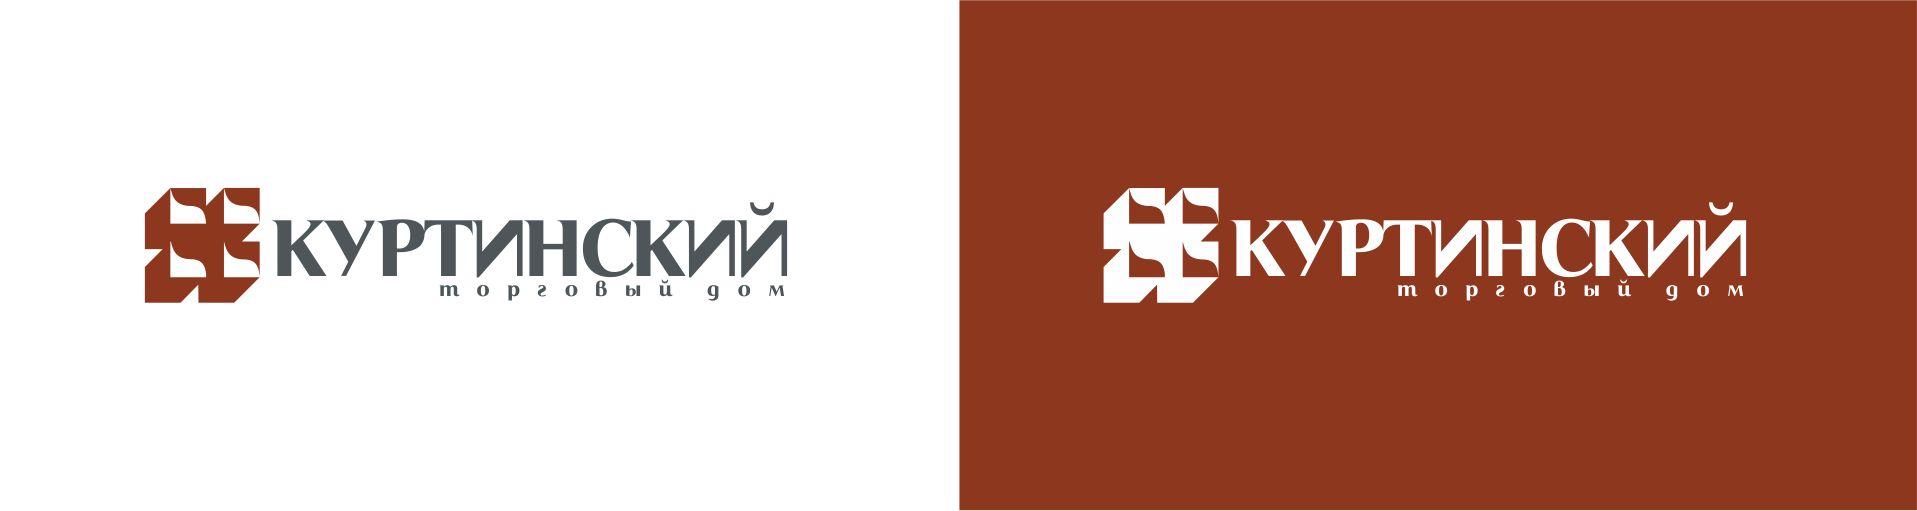 Логотип для камнедобывающей компании фото f_2305b98b12ccf17a.jpg